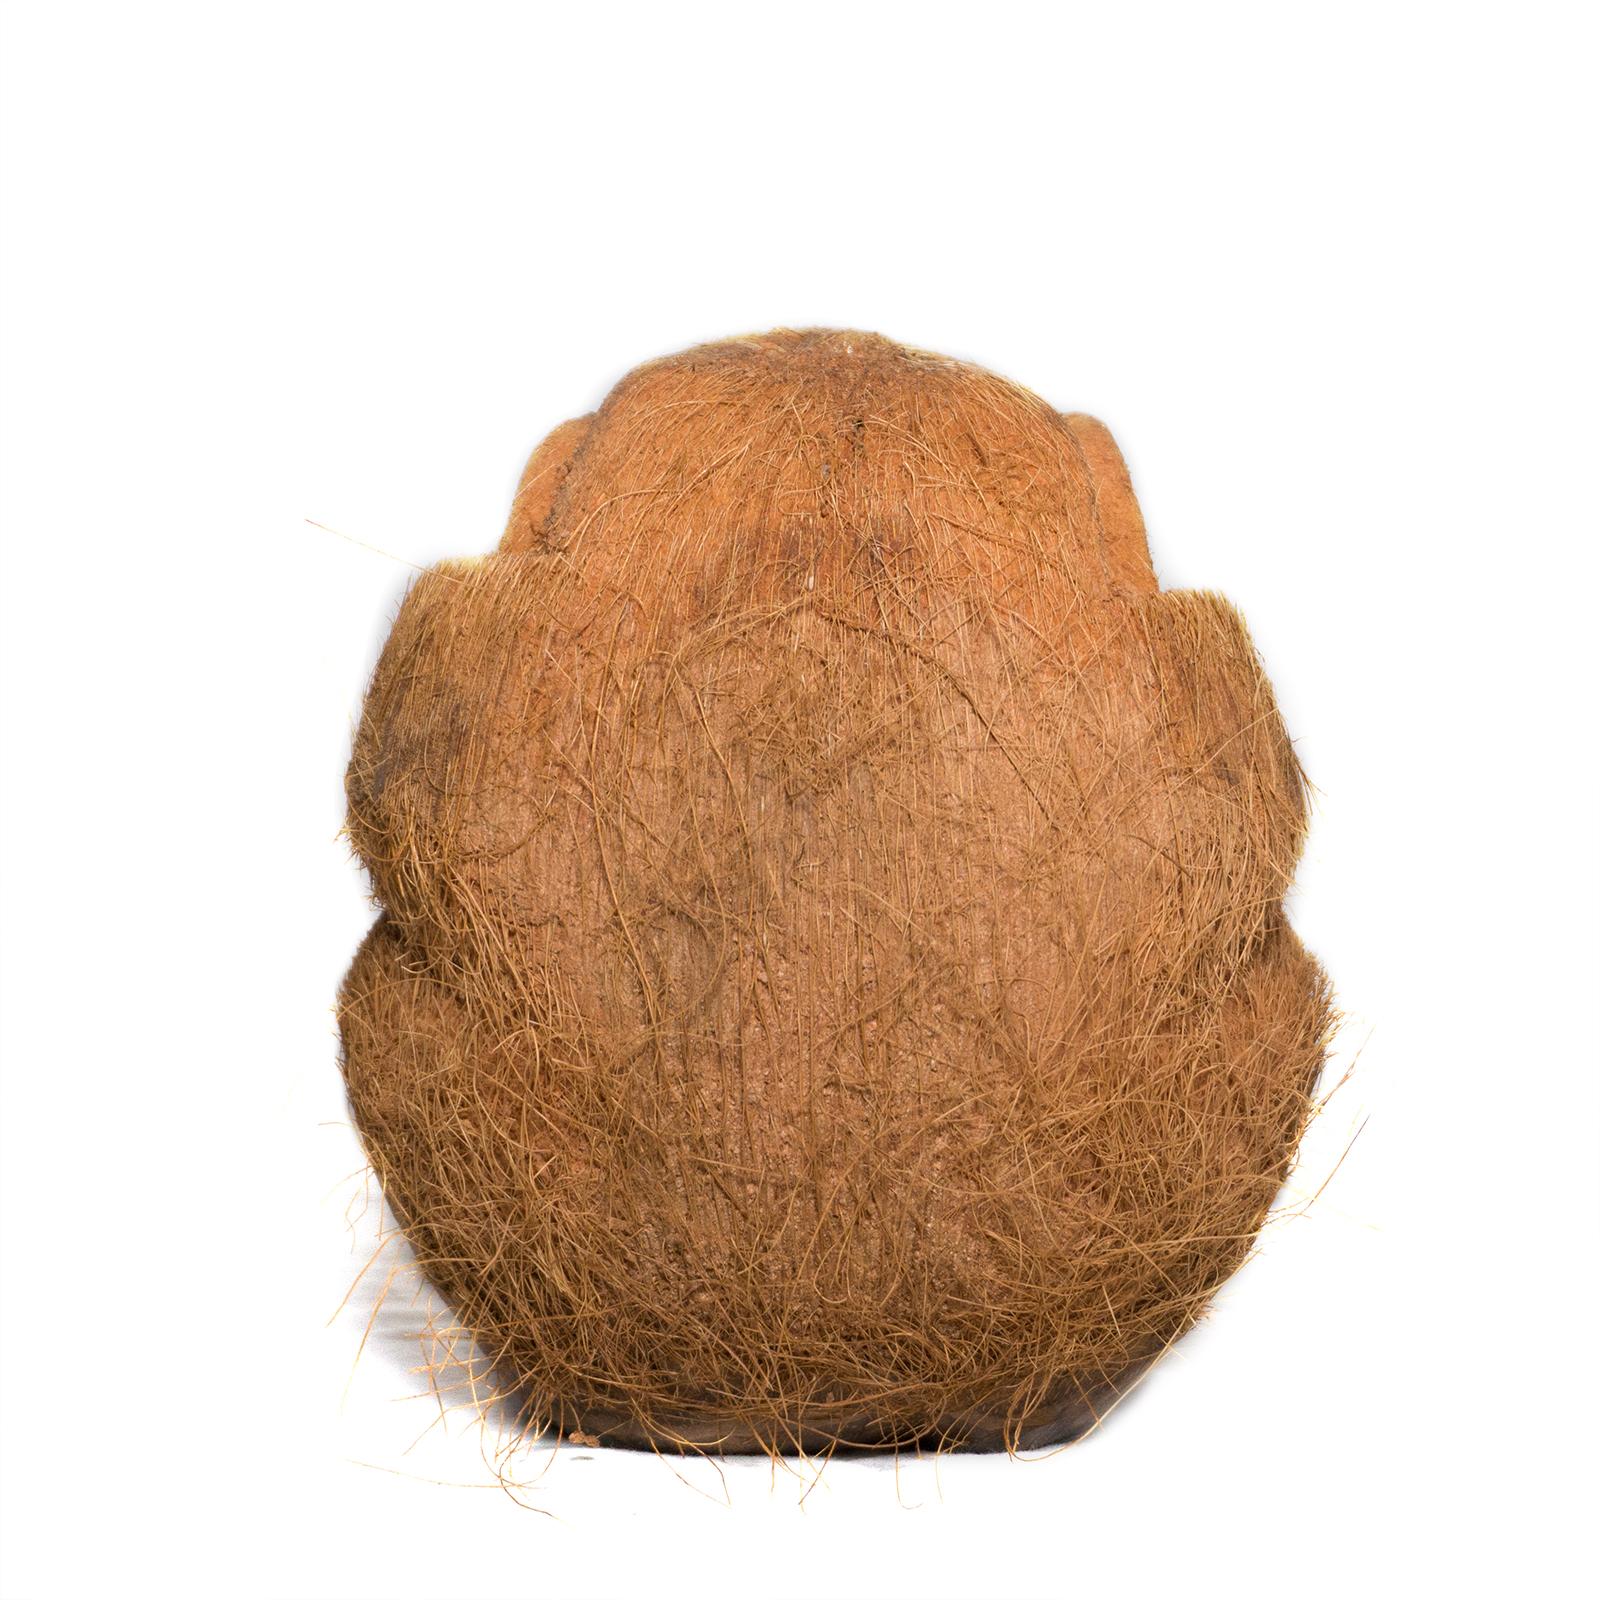 Sehe Nichts Affe Figur aus Kokosnuss ca. 18cm Skulptur – Bild 4